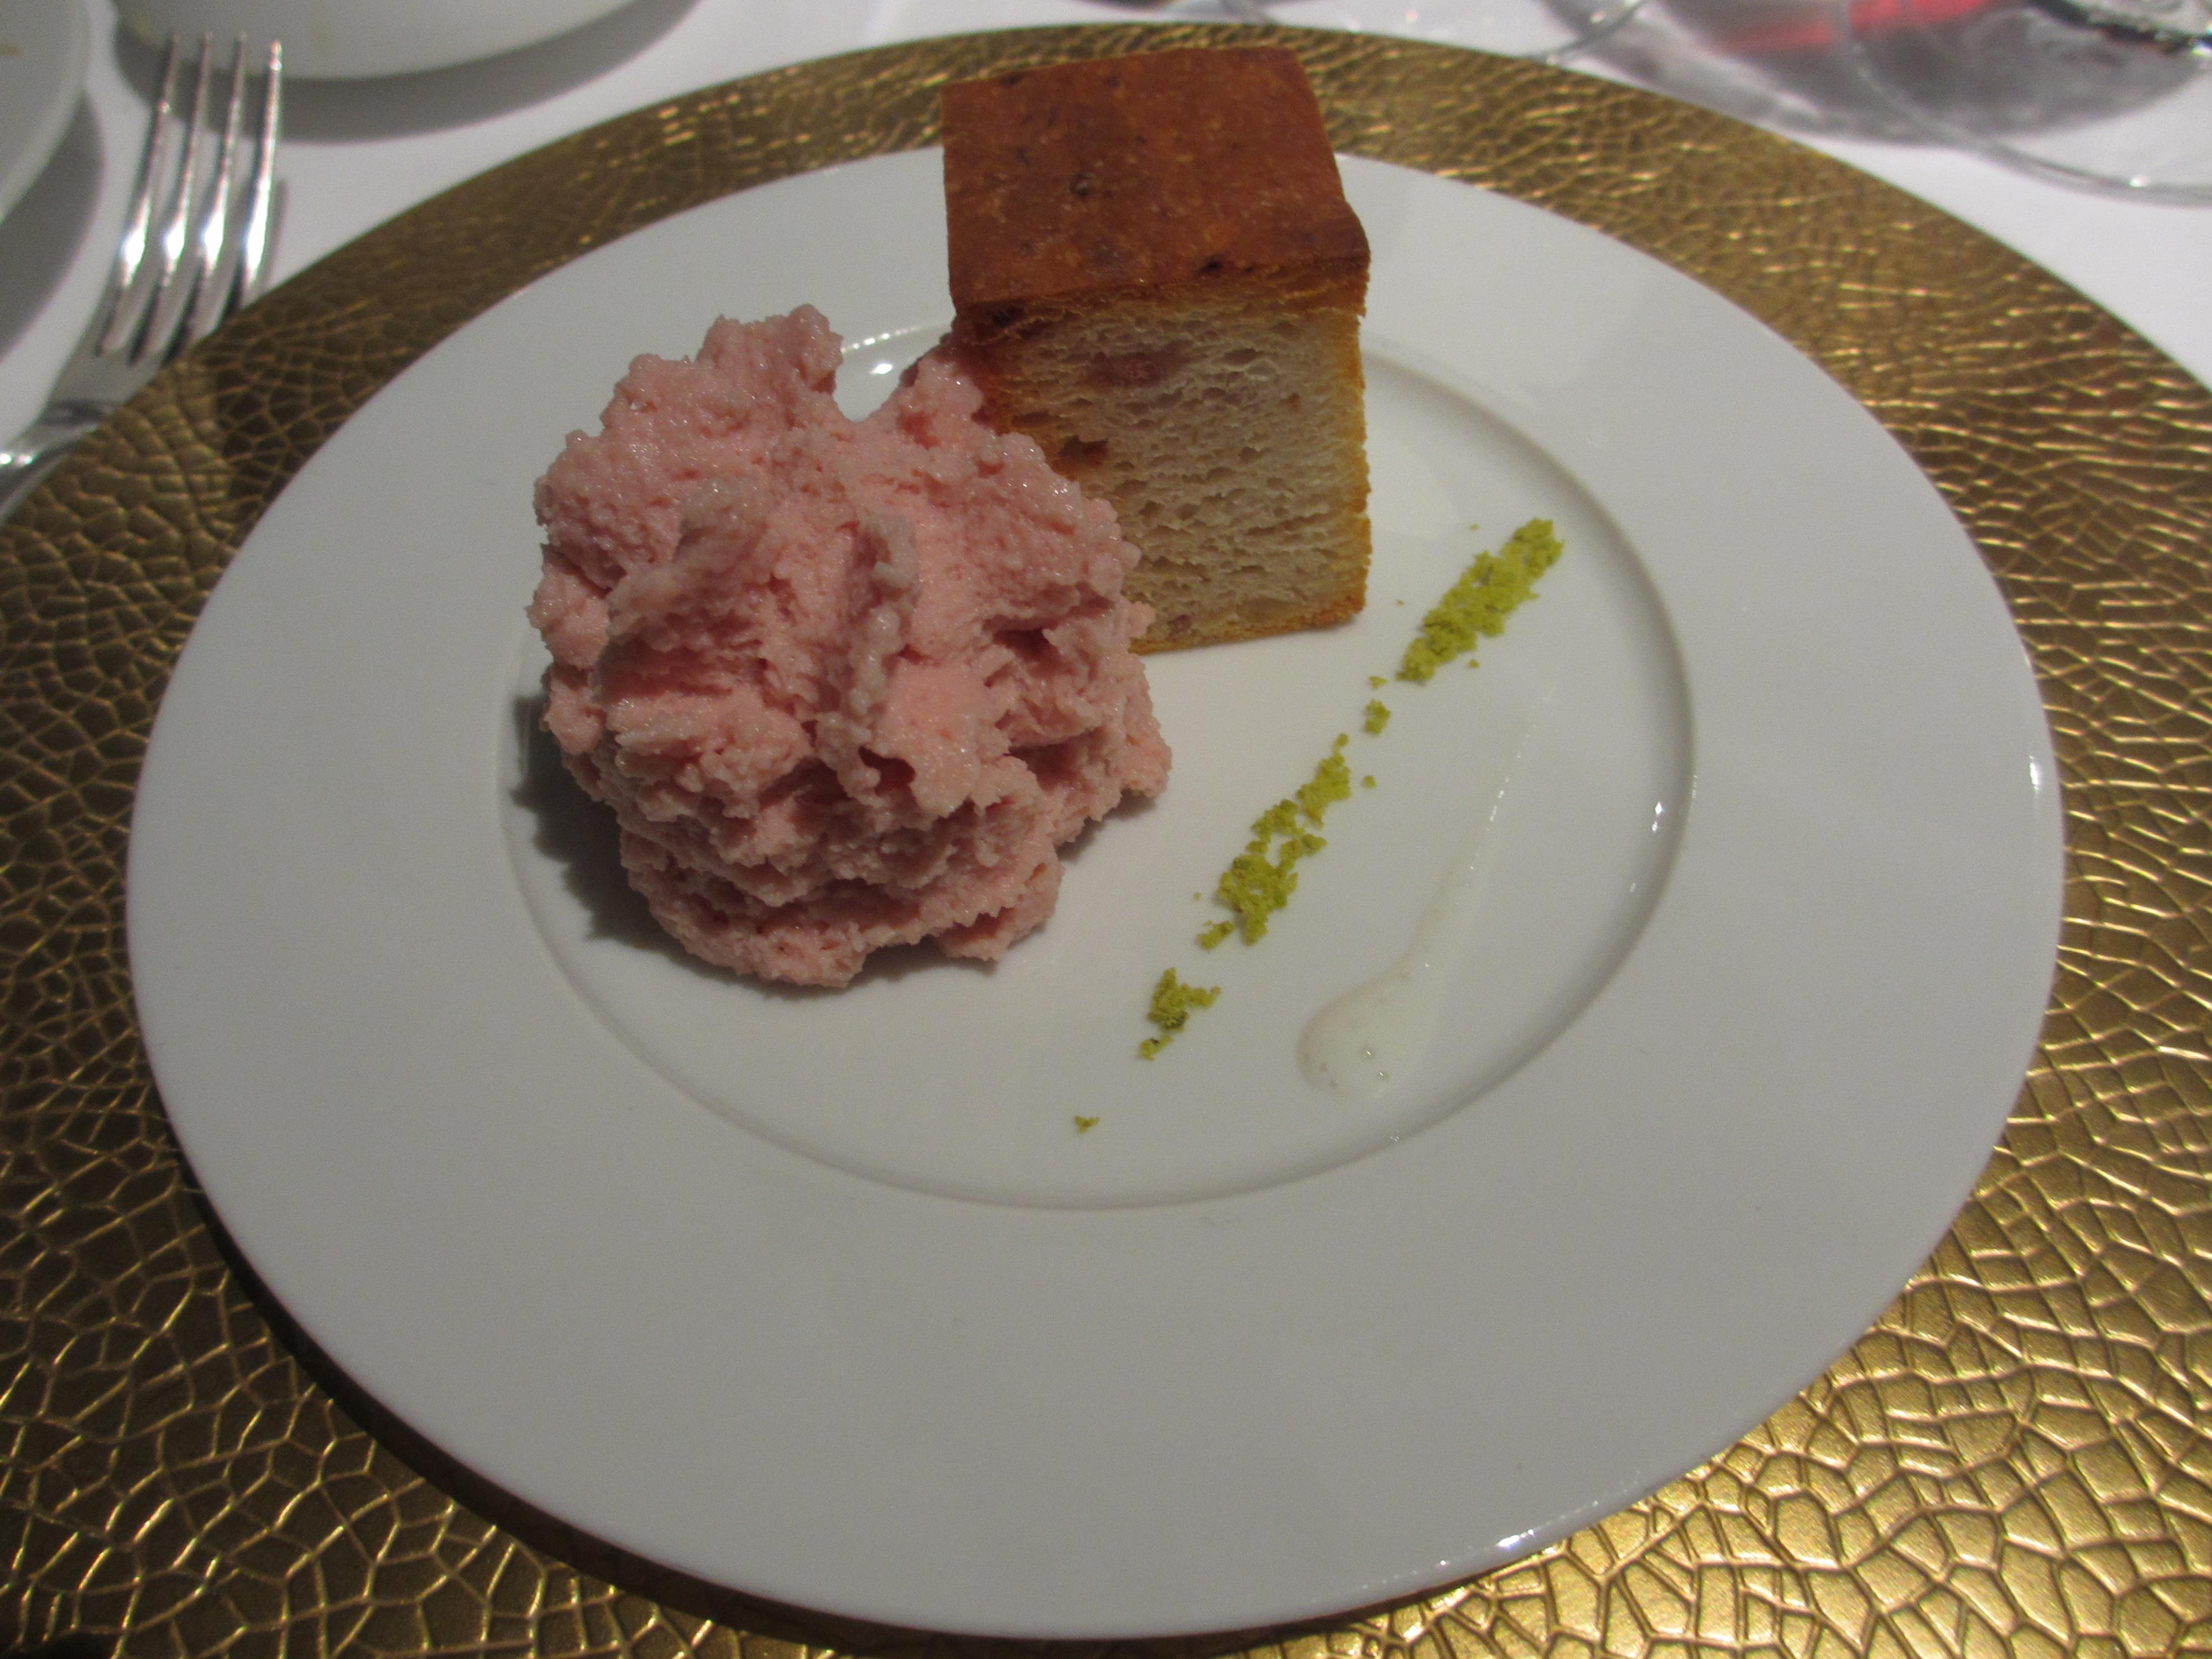 Osteria Francescana in Modena, Italy | ChezCateyLou.com